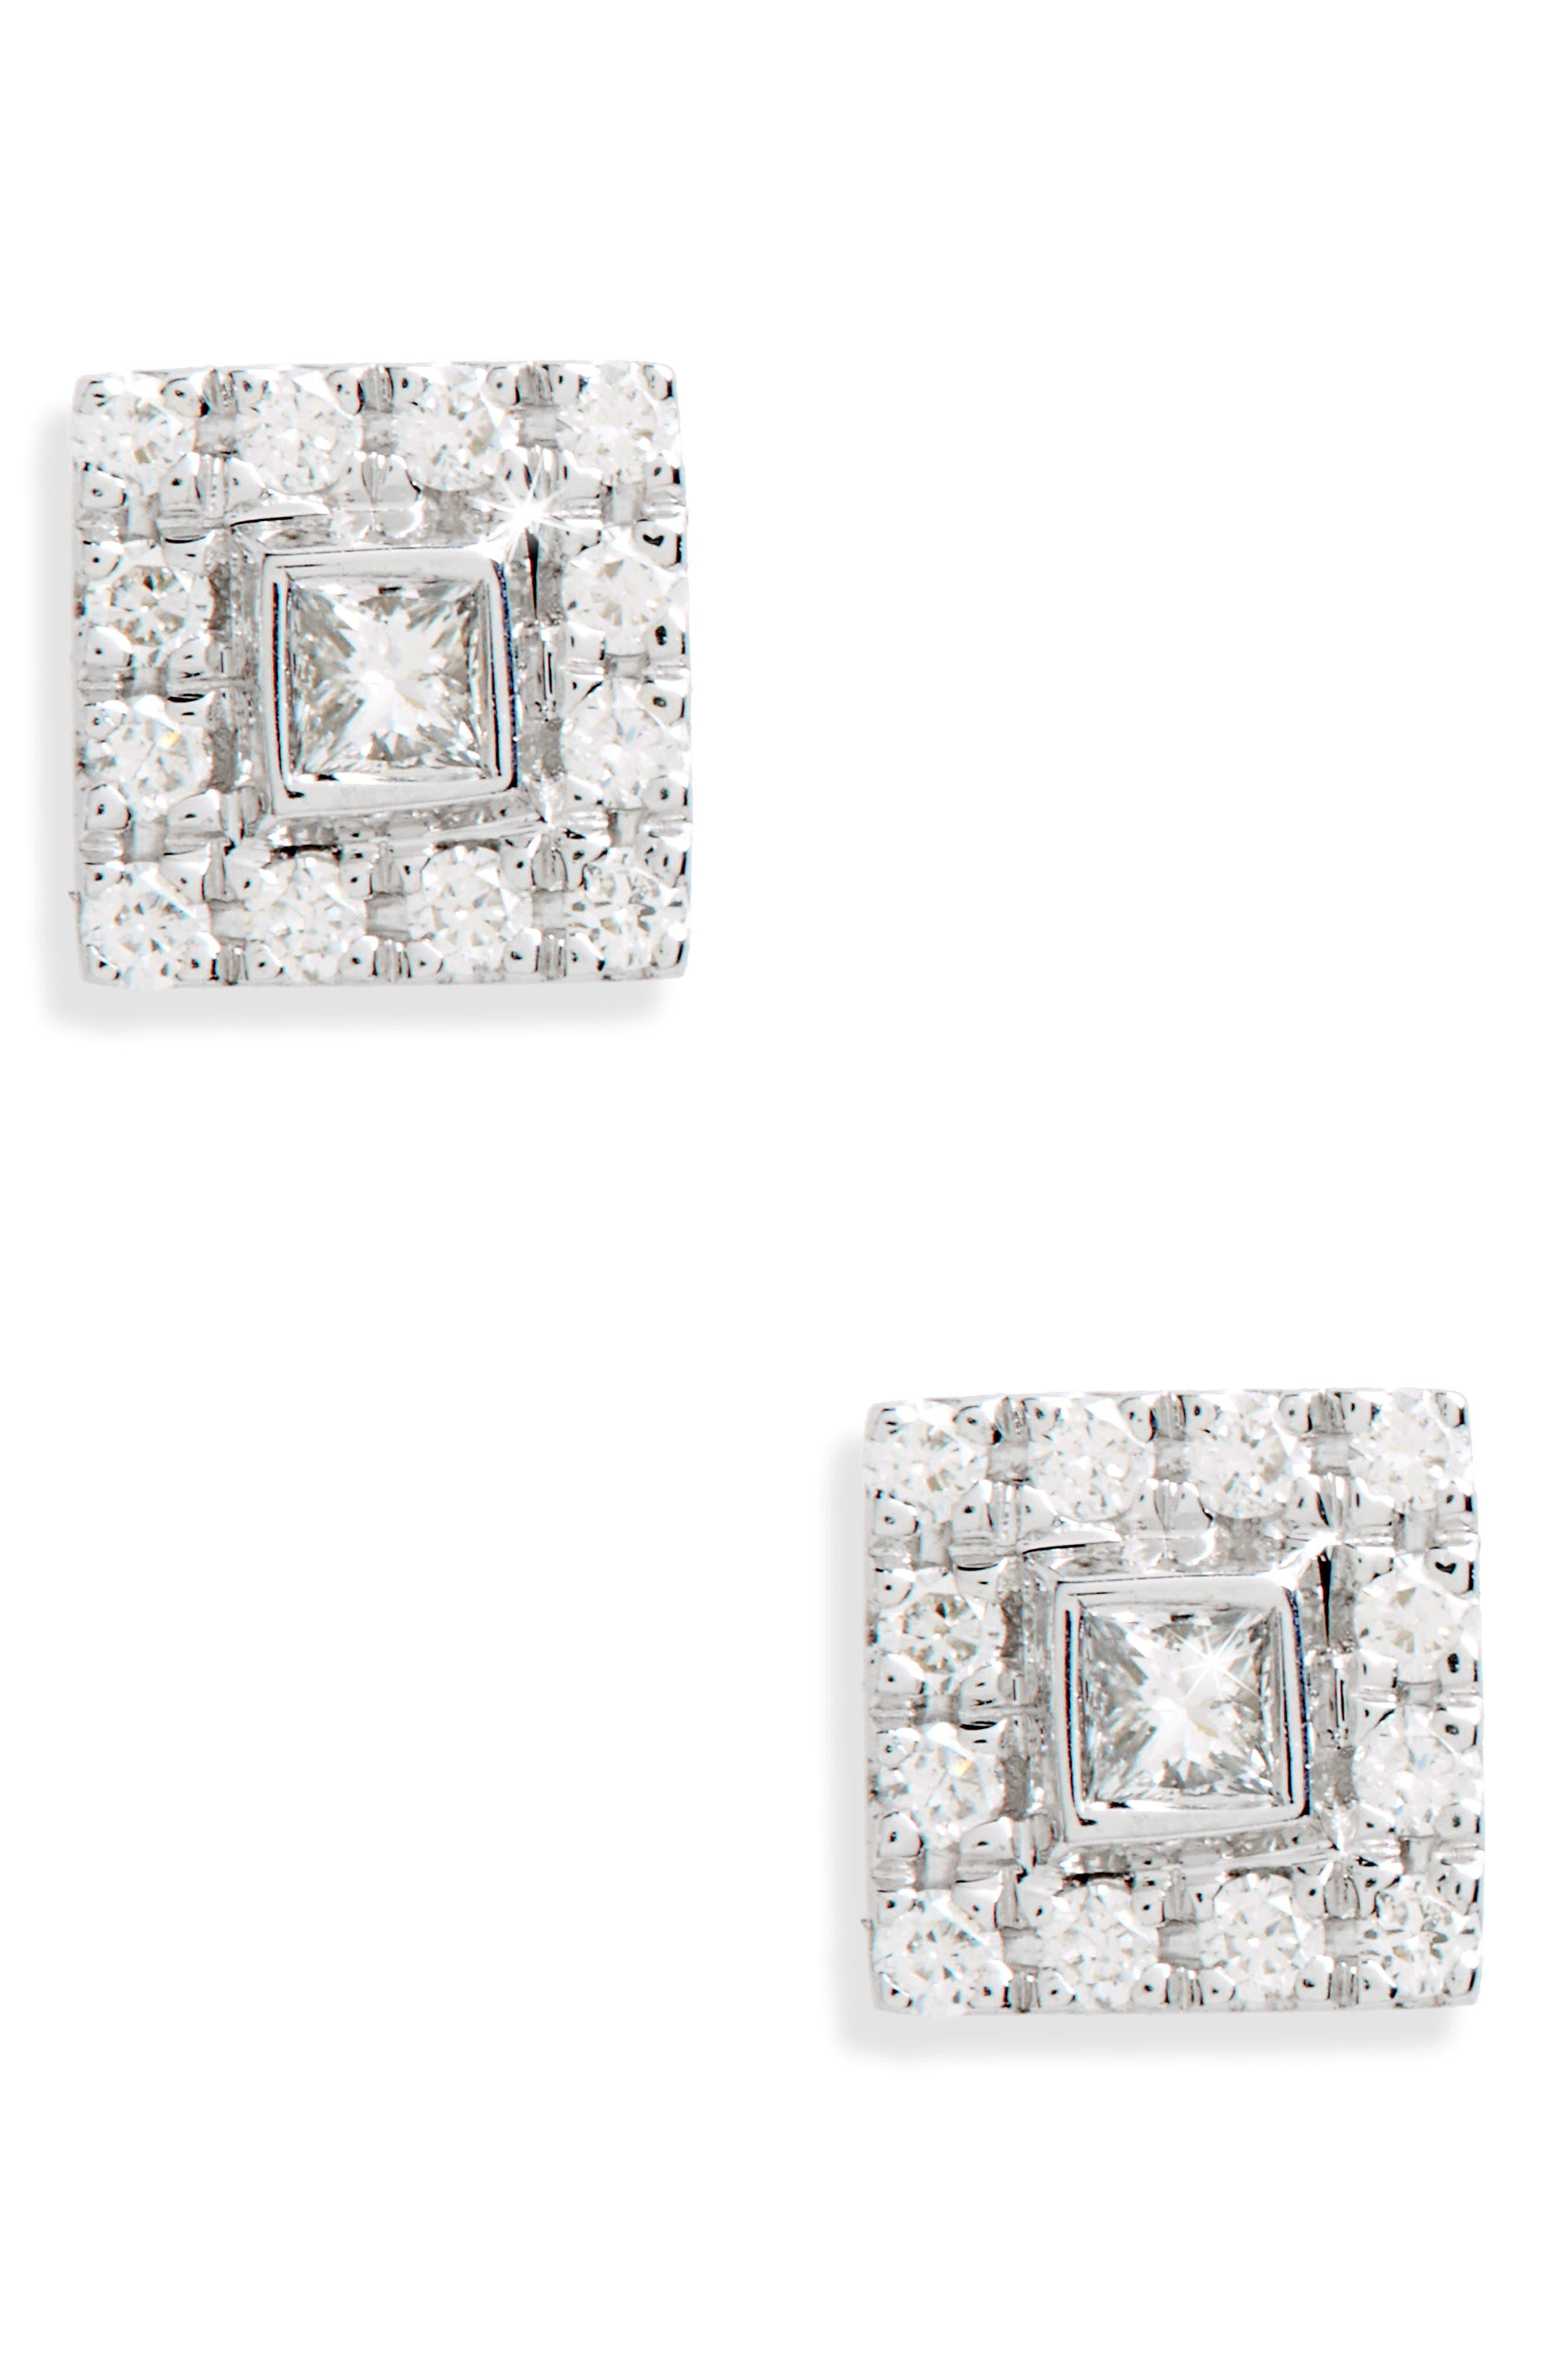 Amara Small Square Diamond Stud Earrings,                         Main,                         color, White Gold